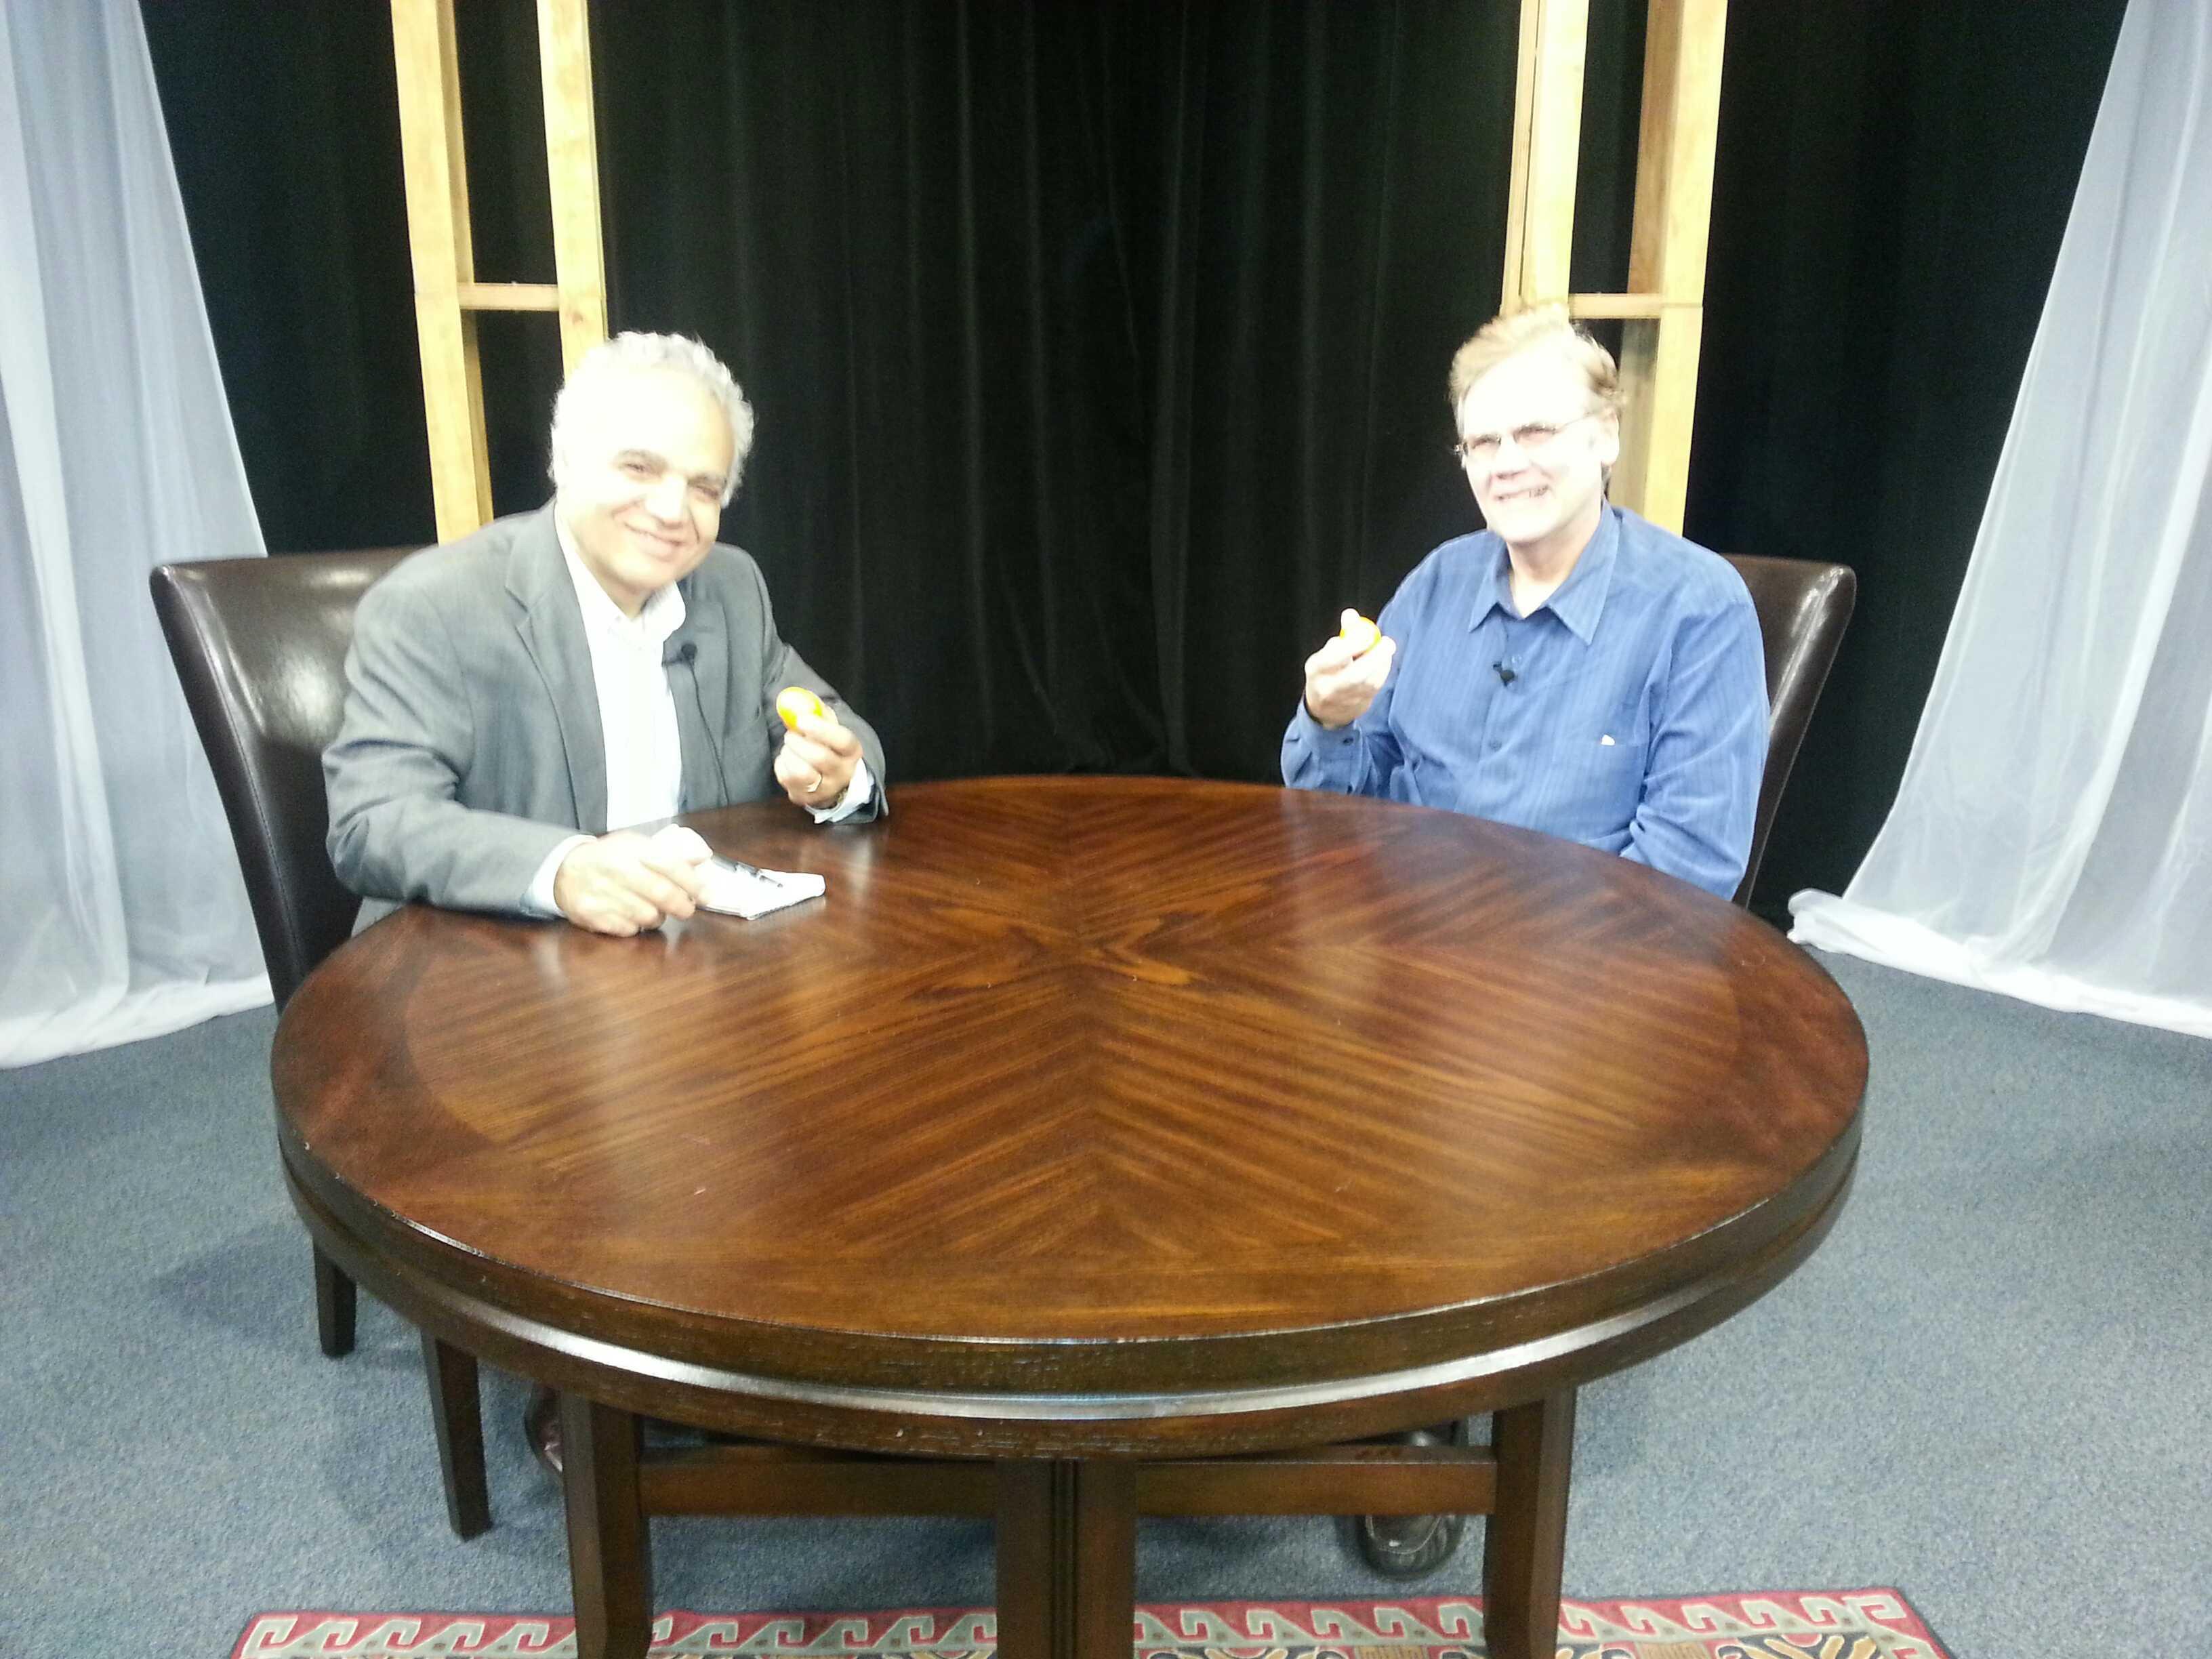 BelAhdan with Bob Meek .. The GOP politics of Obstruction